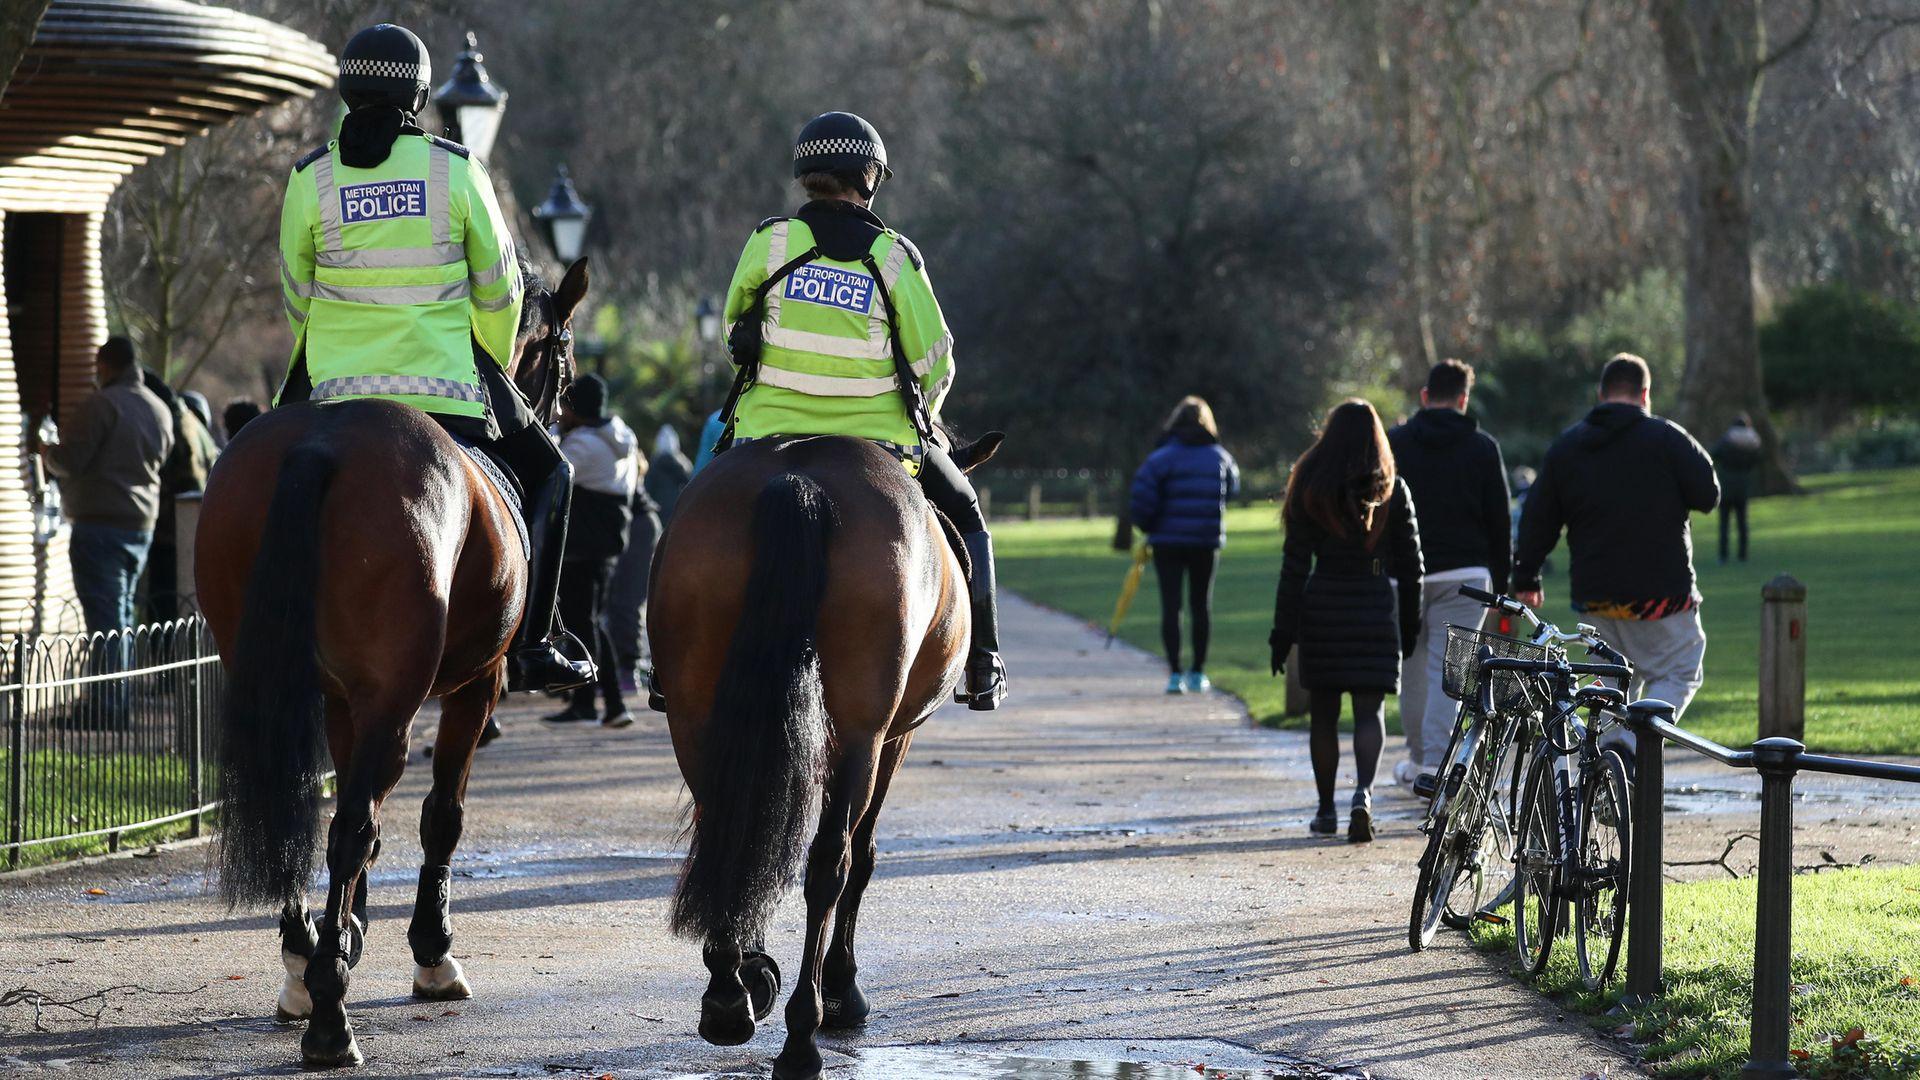 Police patrol on horseback through St James' Park in London. - Credit: PA